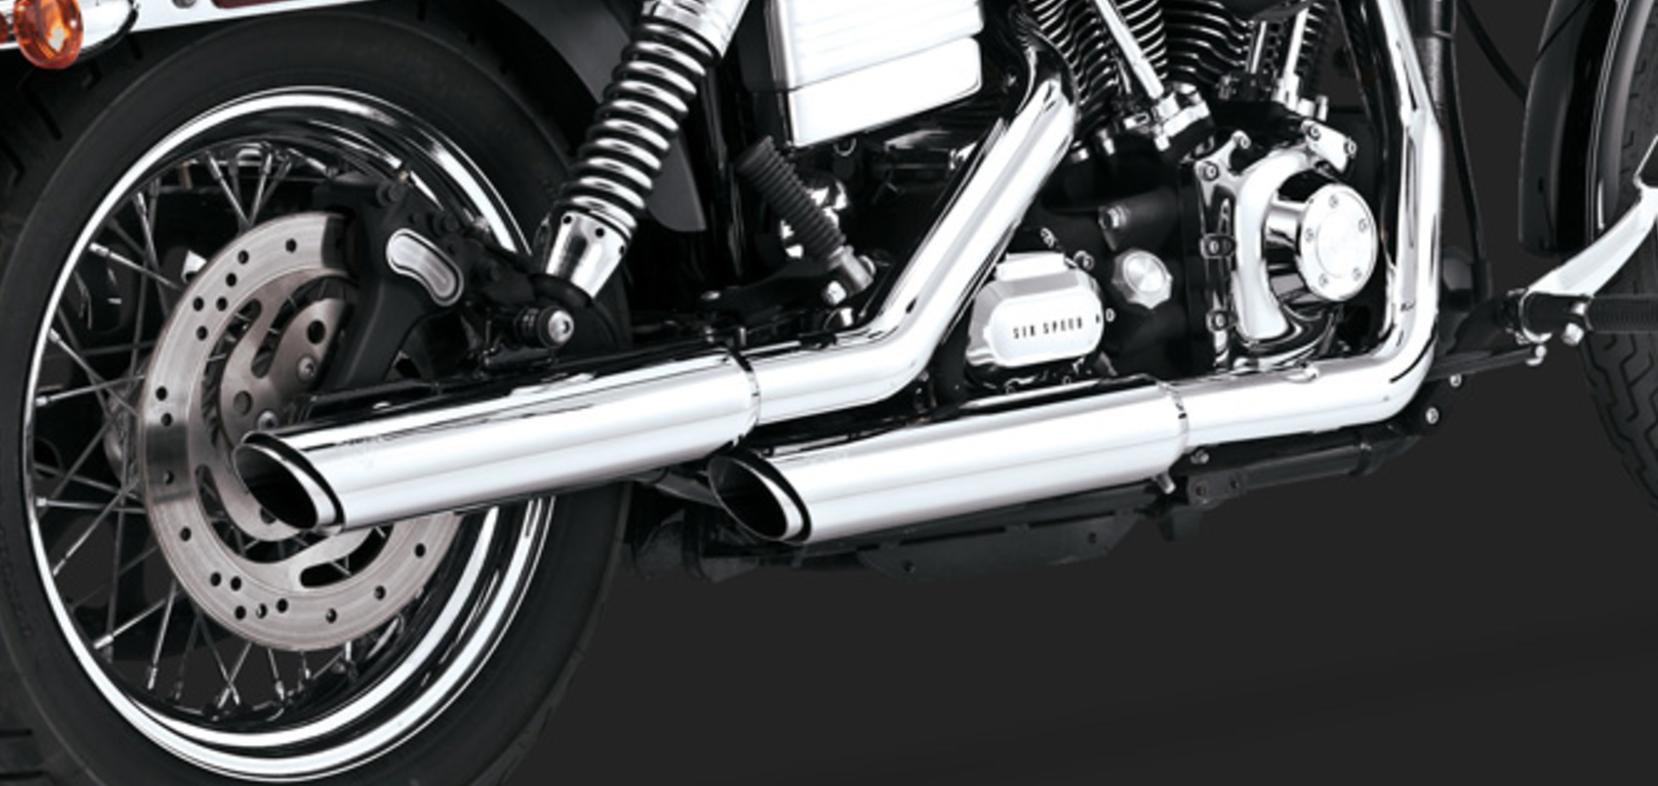 Vance & Hines Twin Slash 3-inch Slip-Ons - Harley Davidson